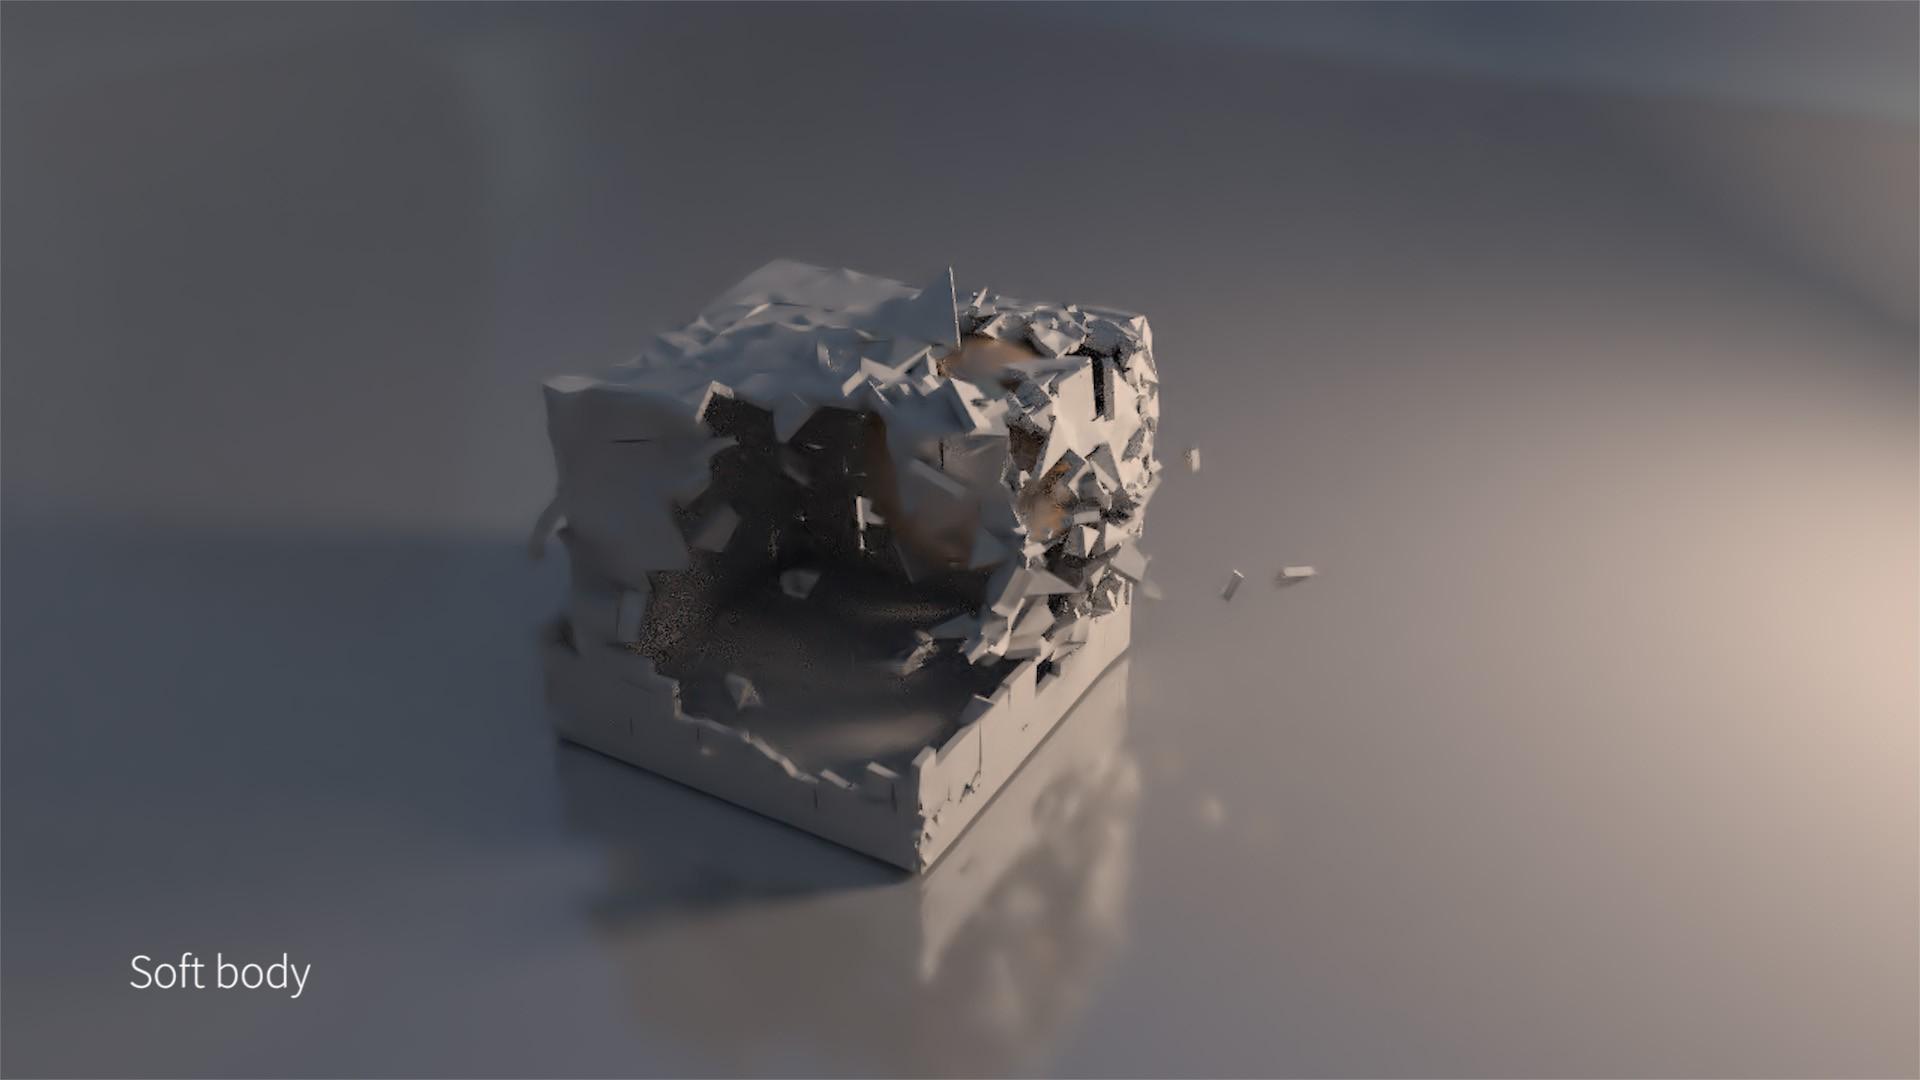 Blender Destruction Tutorial: 9 Ways to Destroy Things